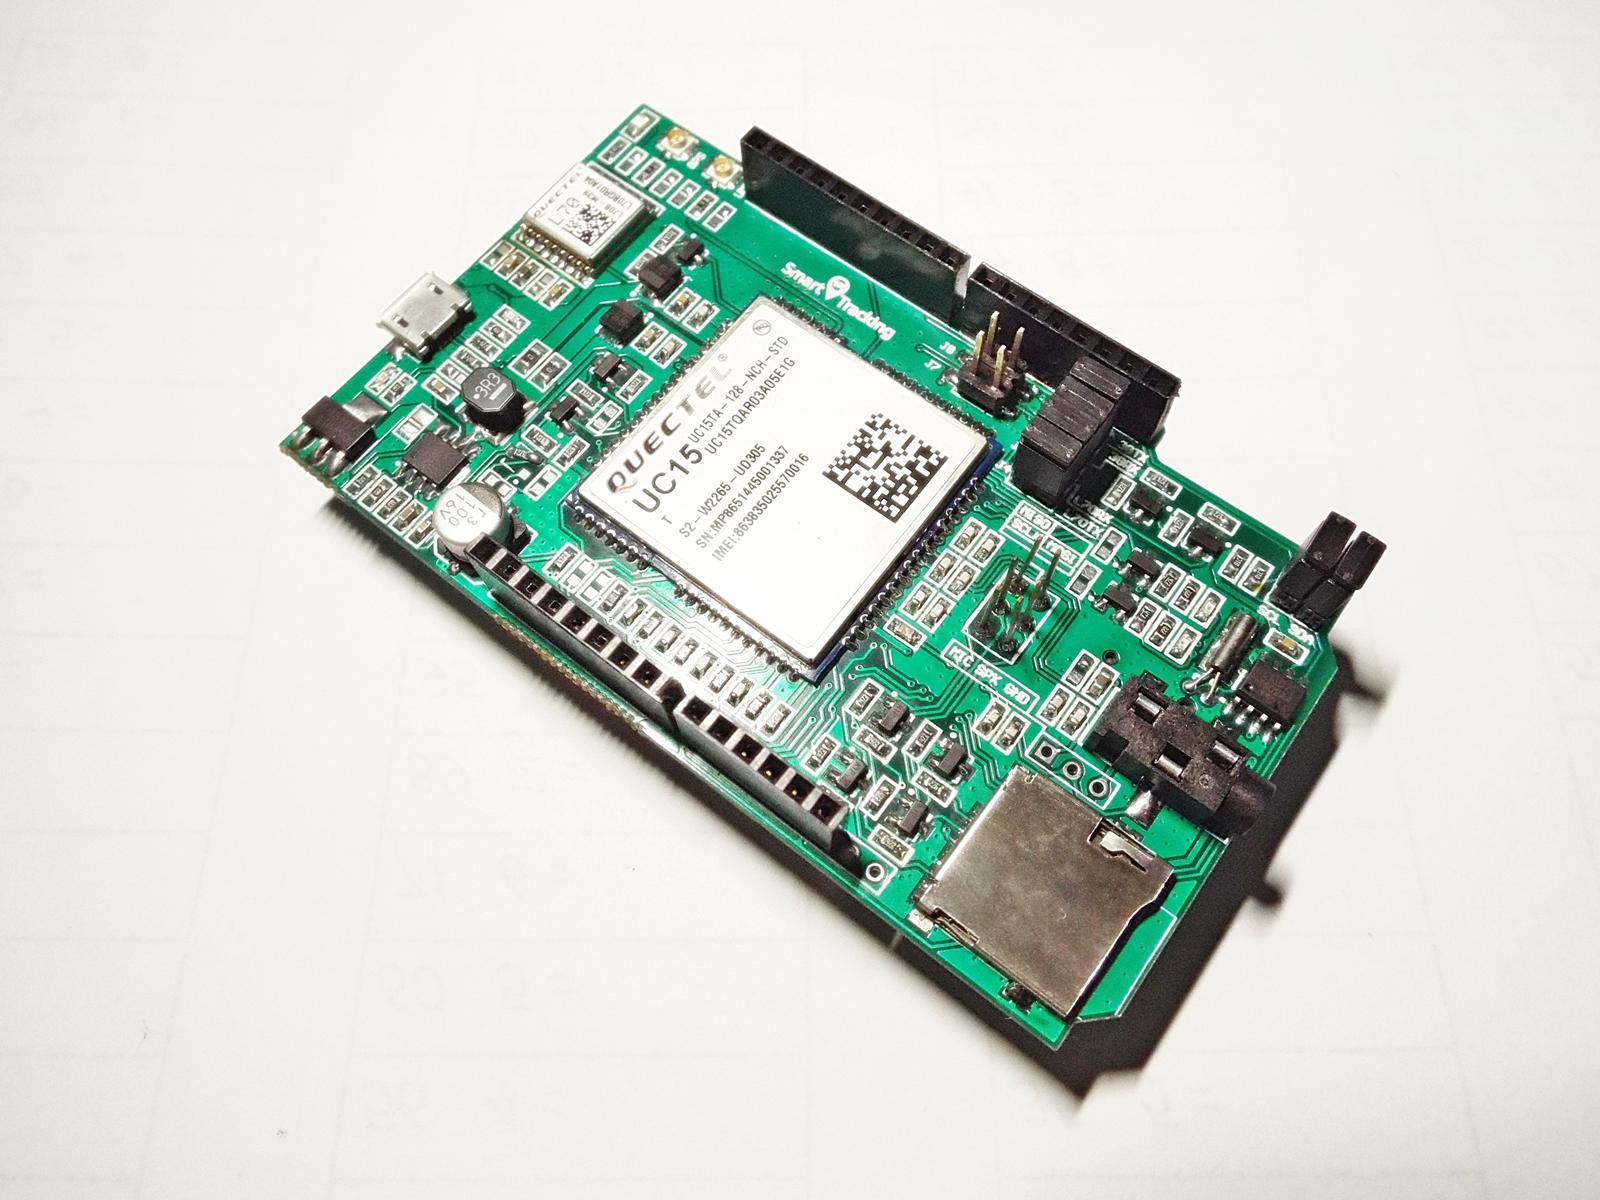 3G & GPS Shield (Arduino Uno และ Mega) + Free 3G/GPS Antennas (Quectel UC15-T)